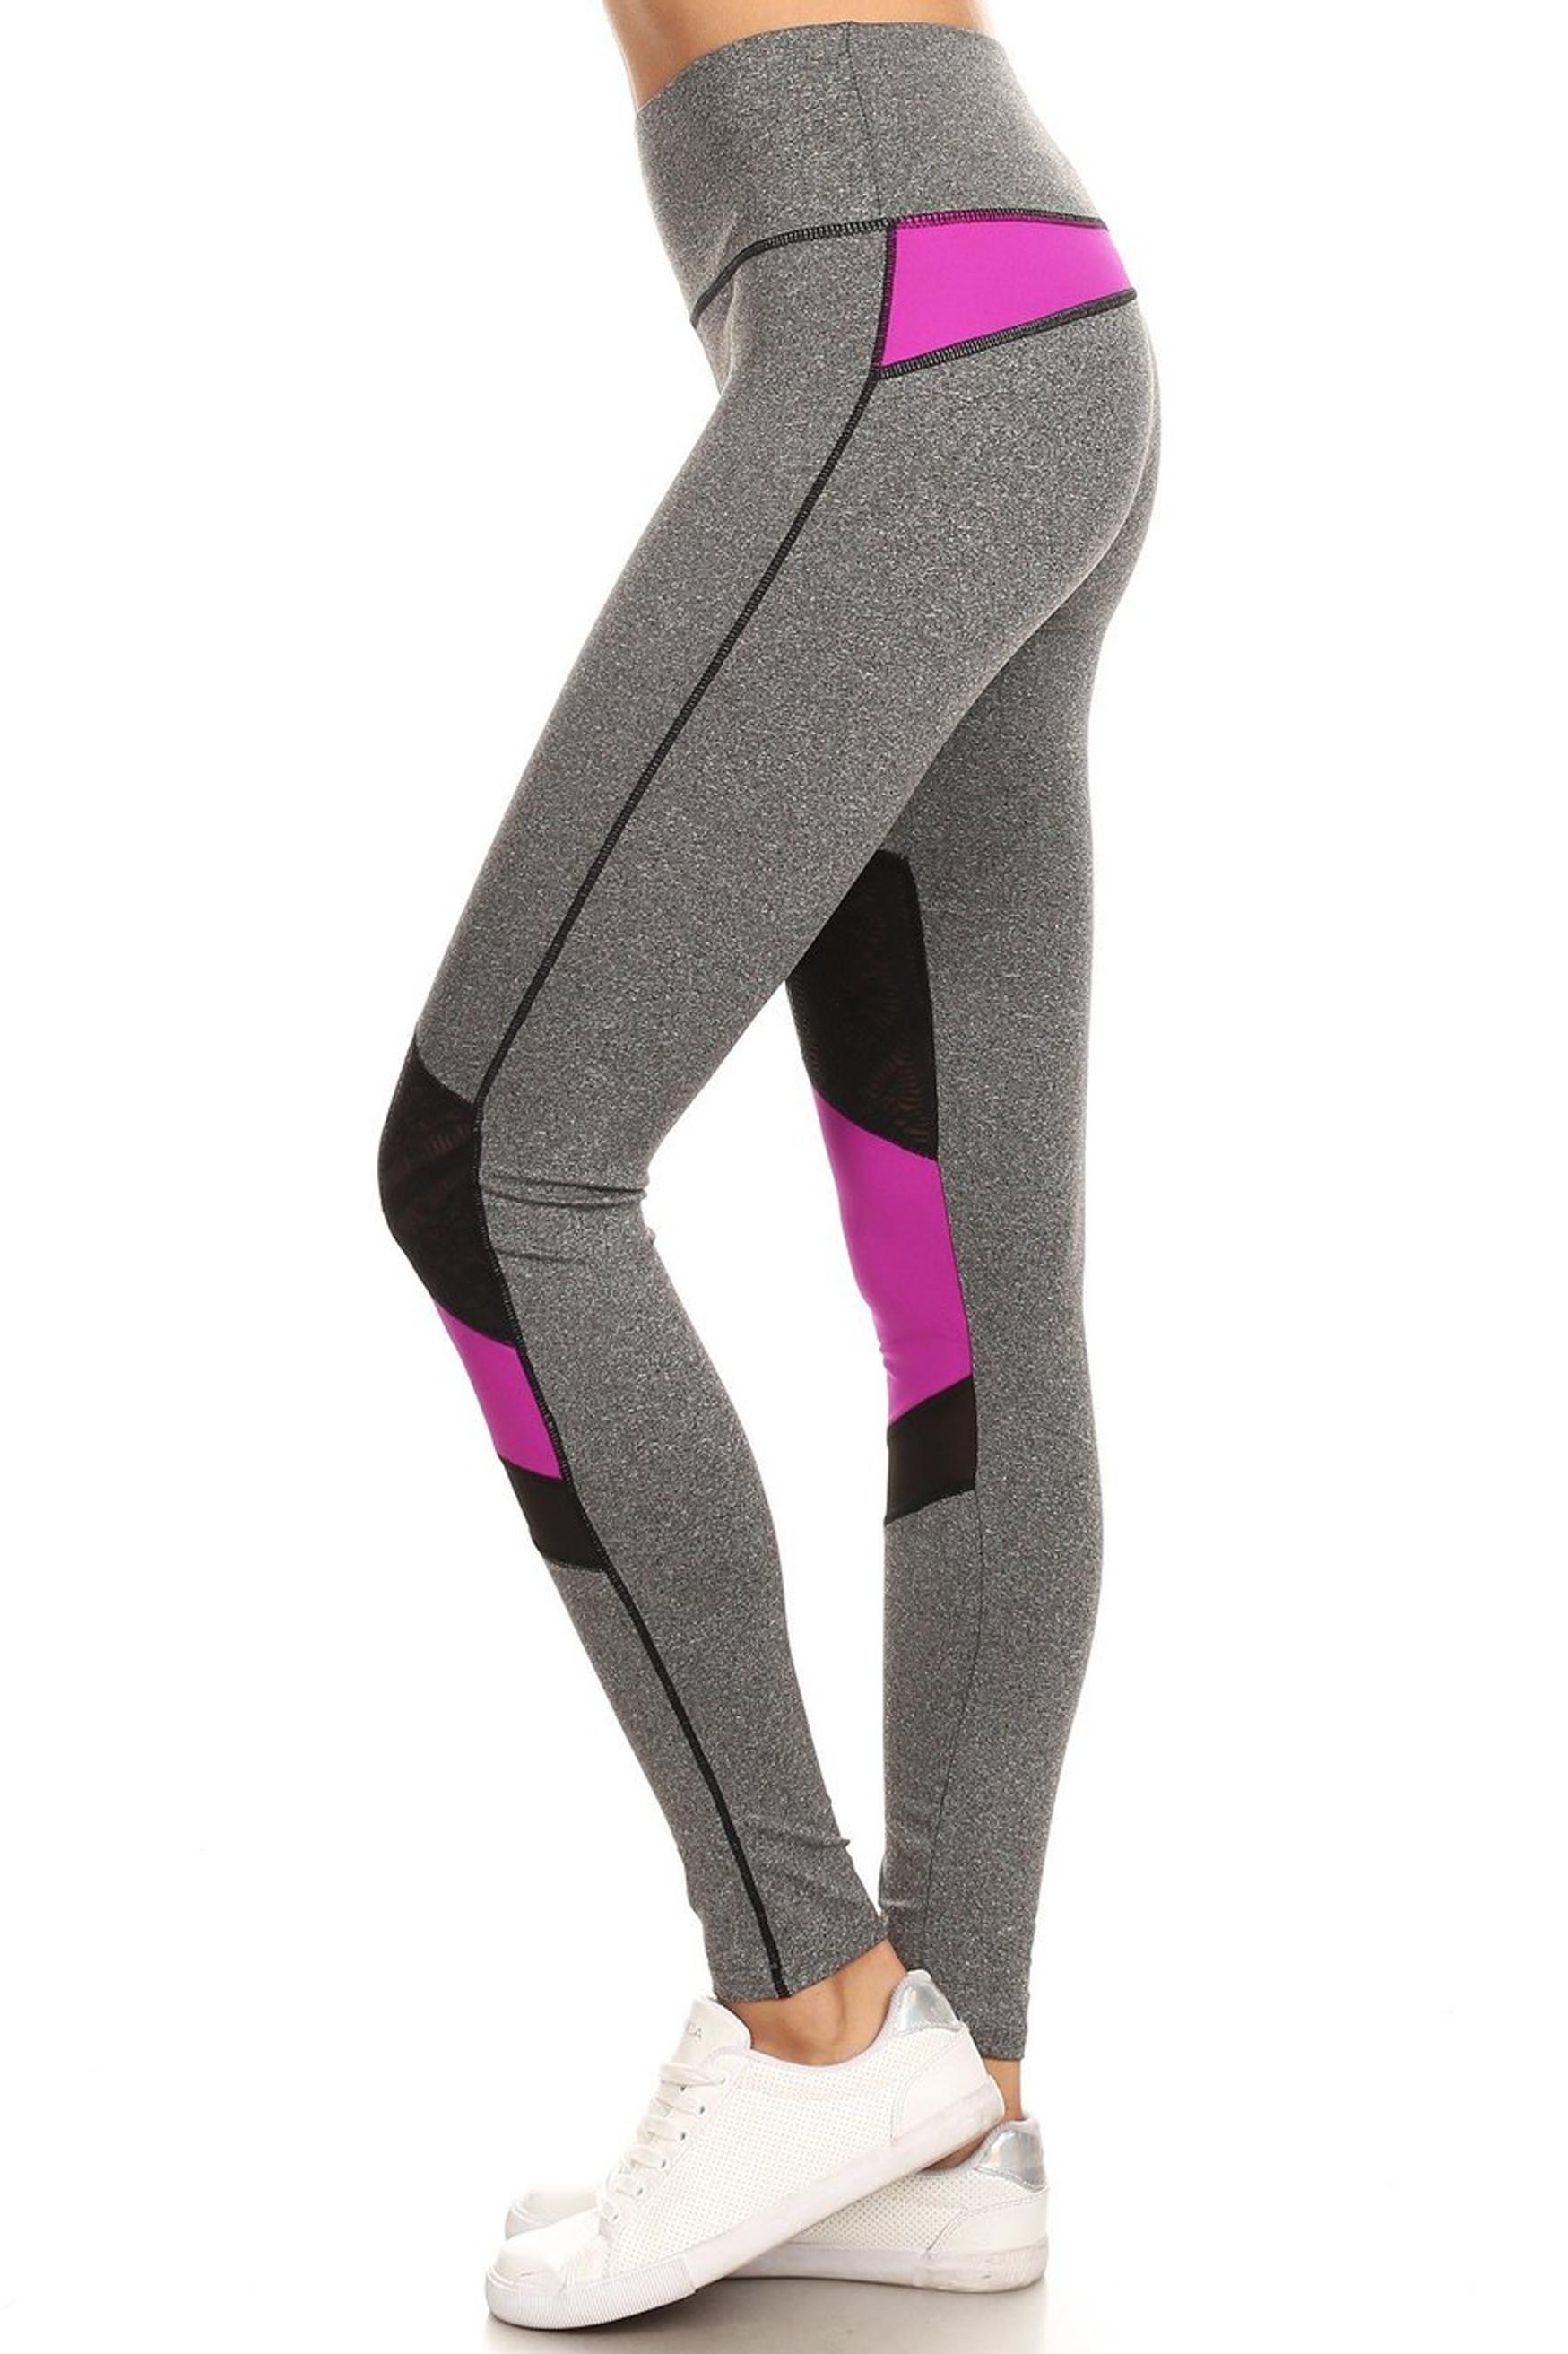 Premium Olive Multi Mesh Panel Workout Leggings